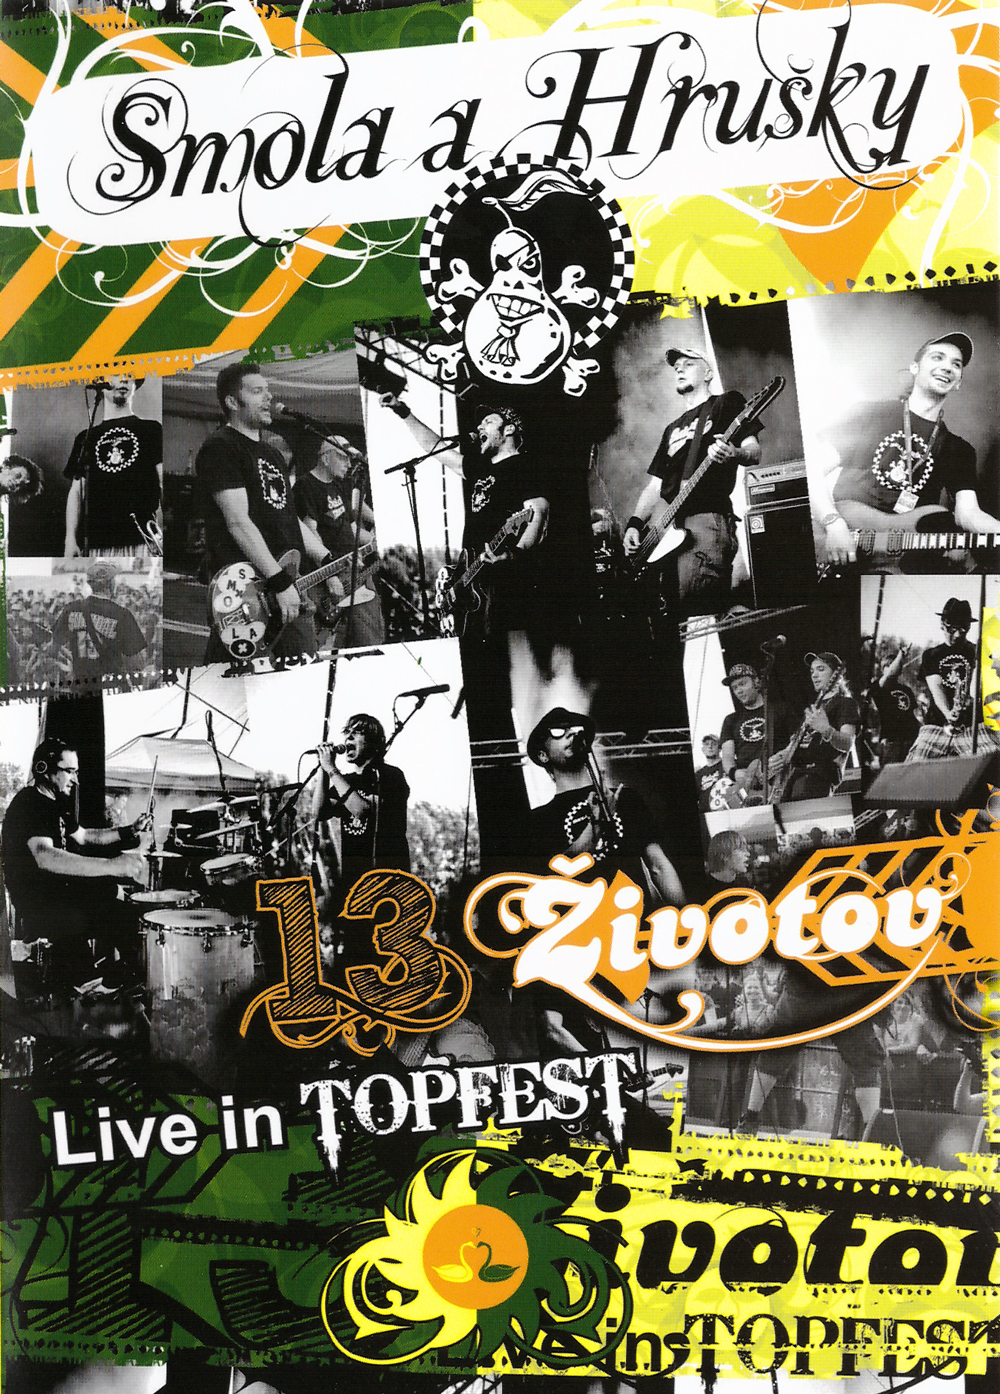 Smola a Hrušky - DVD 13 životov / Live in Topfest